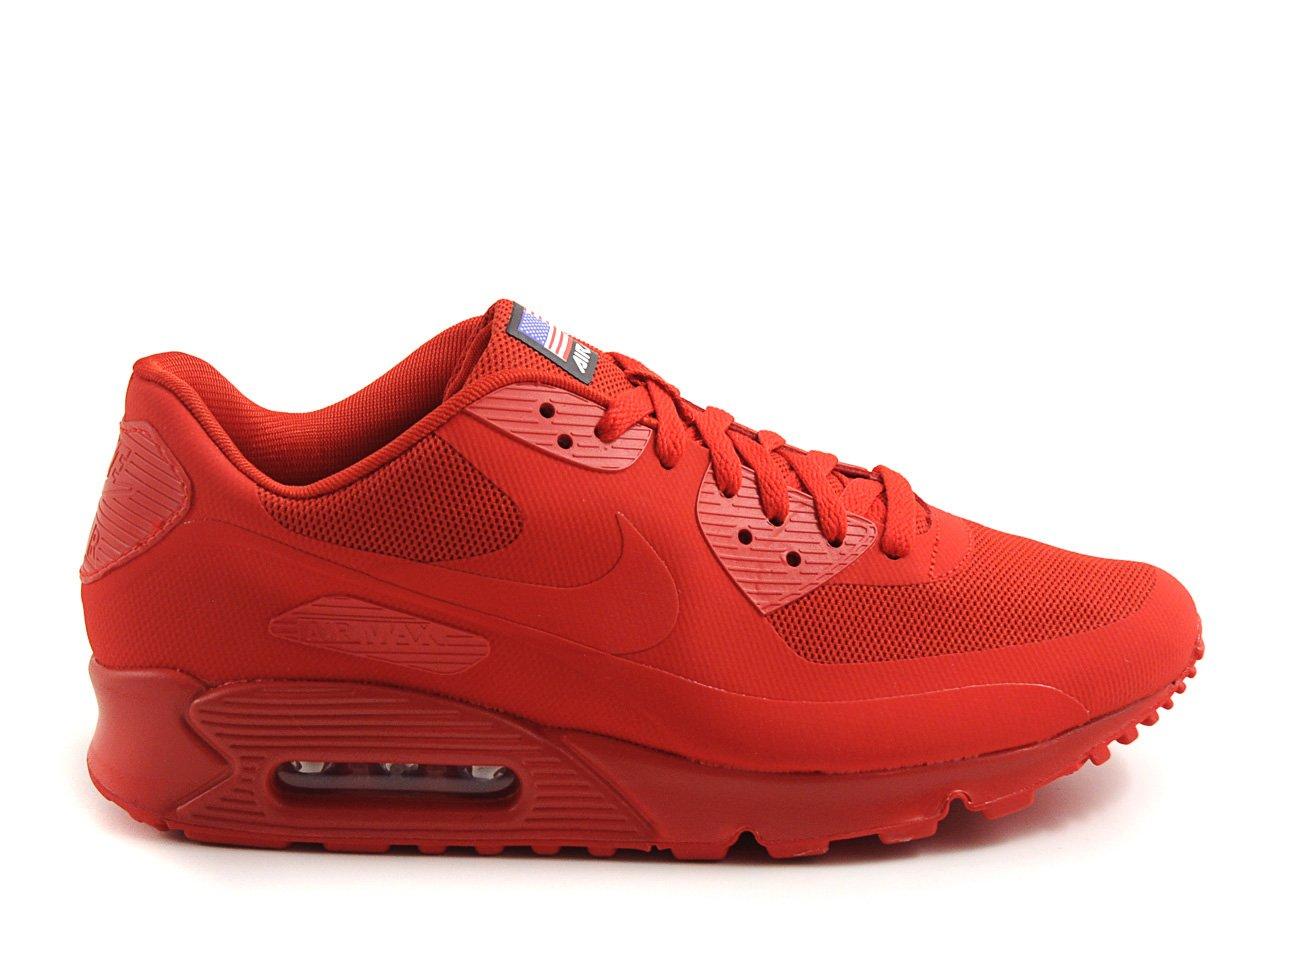 nike air max 90 in red